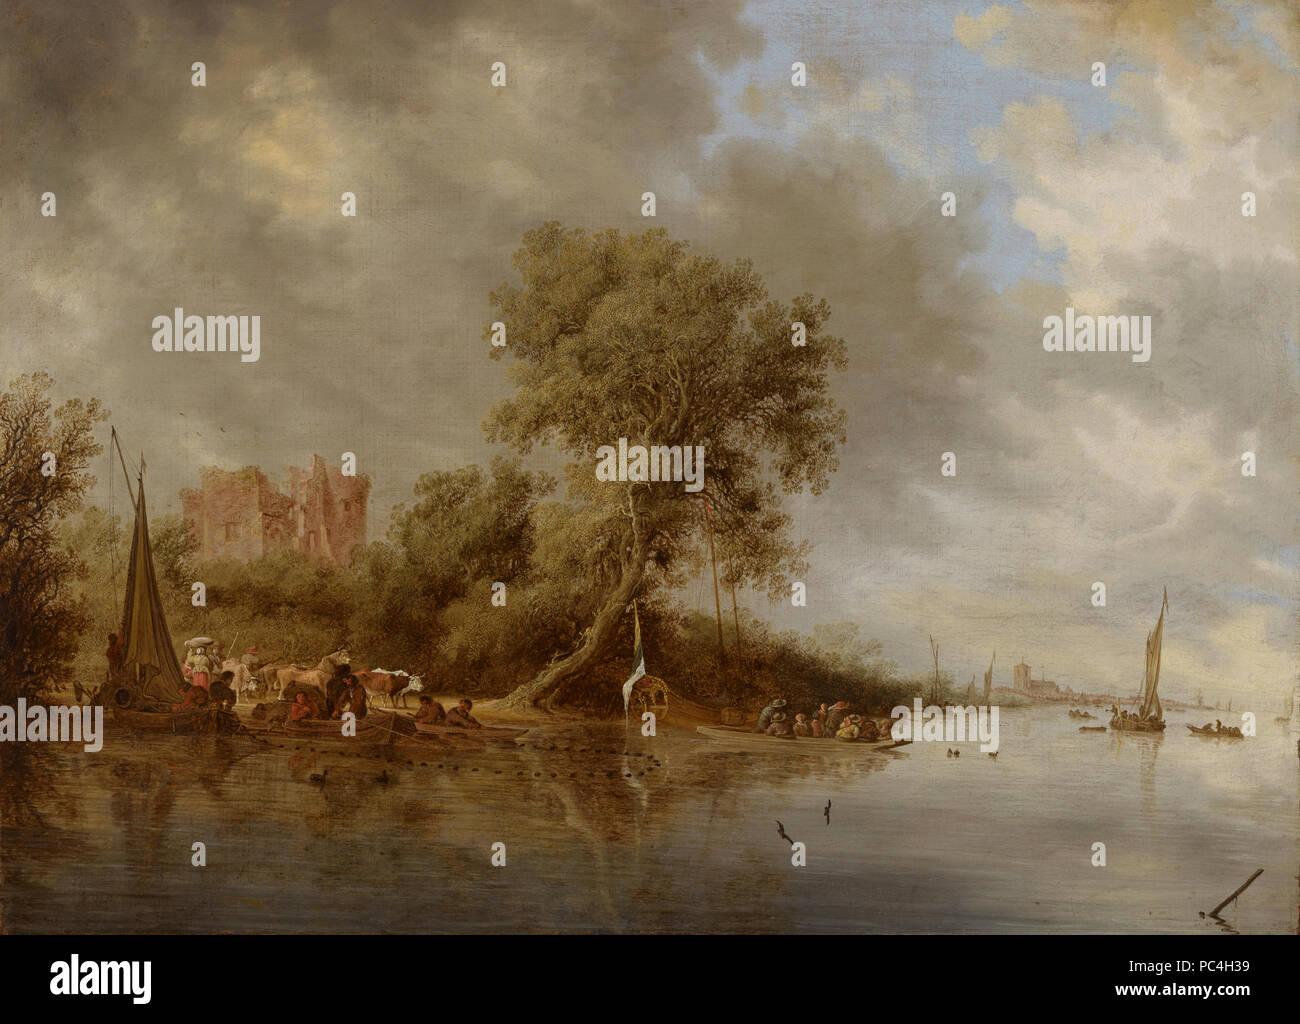 539 Salomon Jacobsz. van Ruysdael (1600-1603–1670)- River Landscape with the Ruins of the Castle of Egmond - Jokimaisema, Egmondin linnan raunio - Flodlandskap, slottet Egmonds ruiner (28845490893) Stock Photo